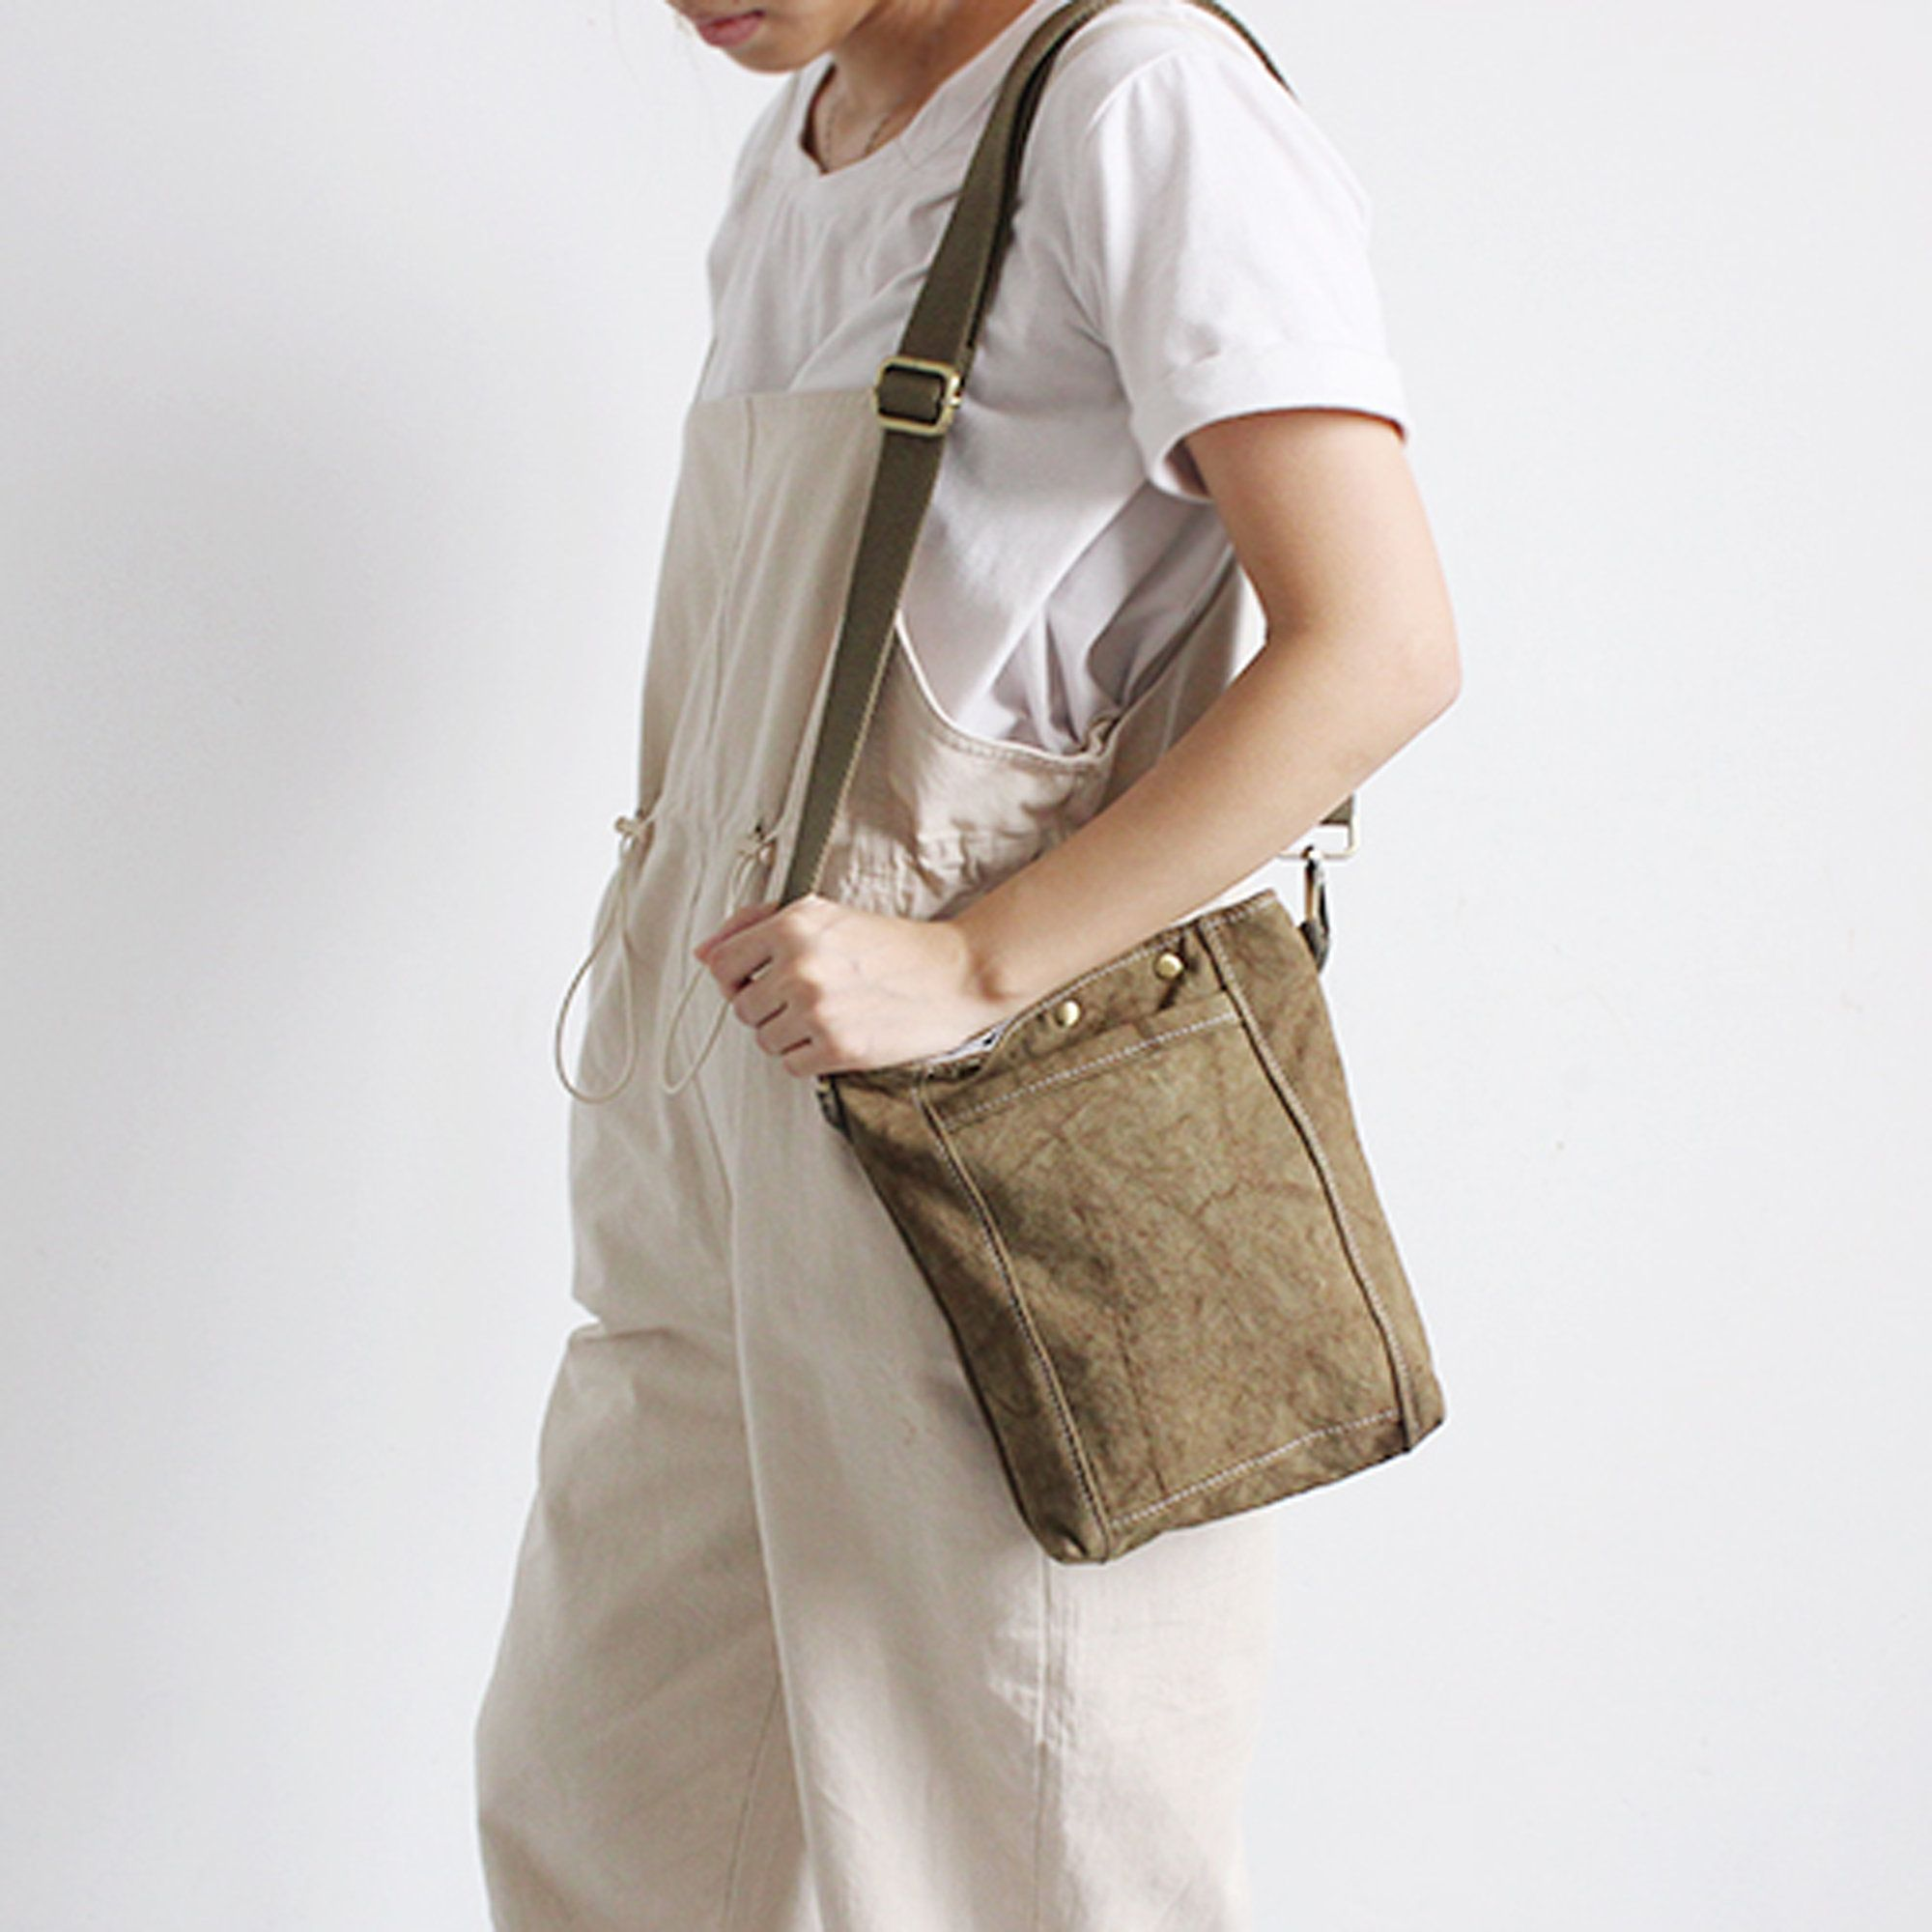 Retro Bucket Bag Handbag Lady/'s Shoulder Bag Tote Bag Teacher Bag Collage Bag Brown Tote Bag Large Tote Bag Shopping Bag Tote Bags For Women